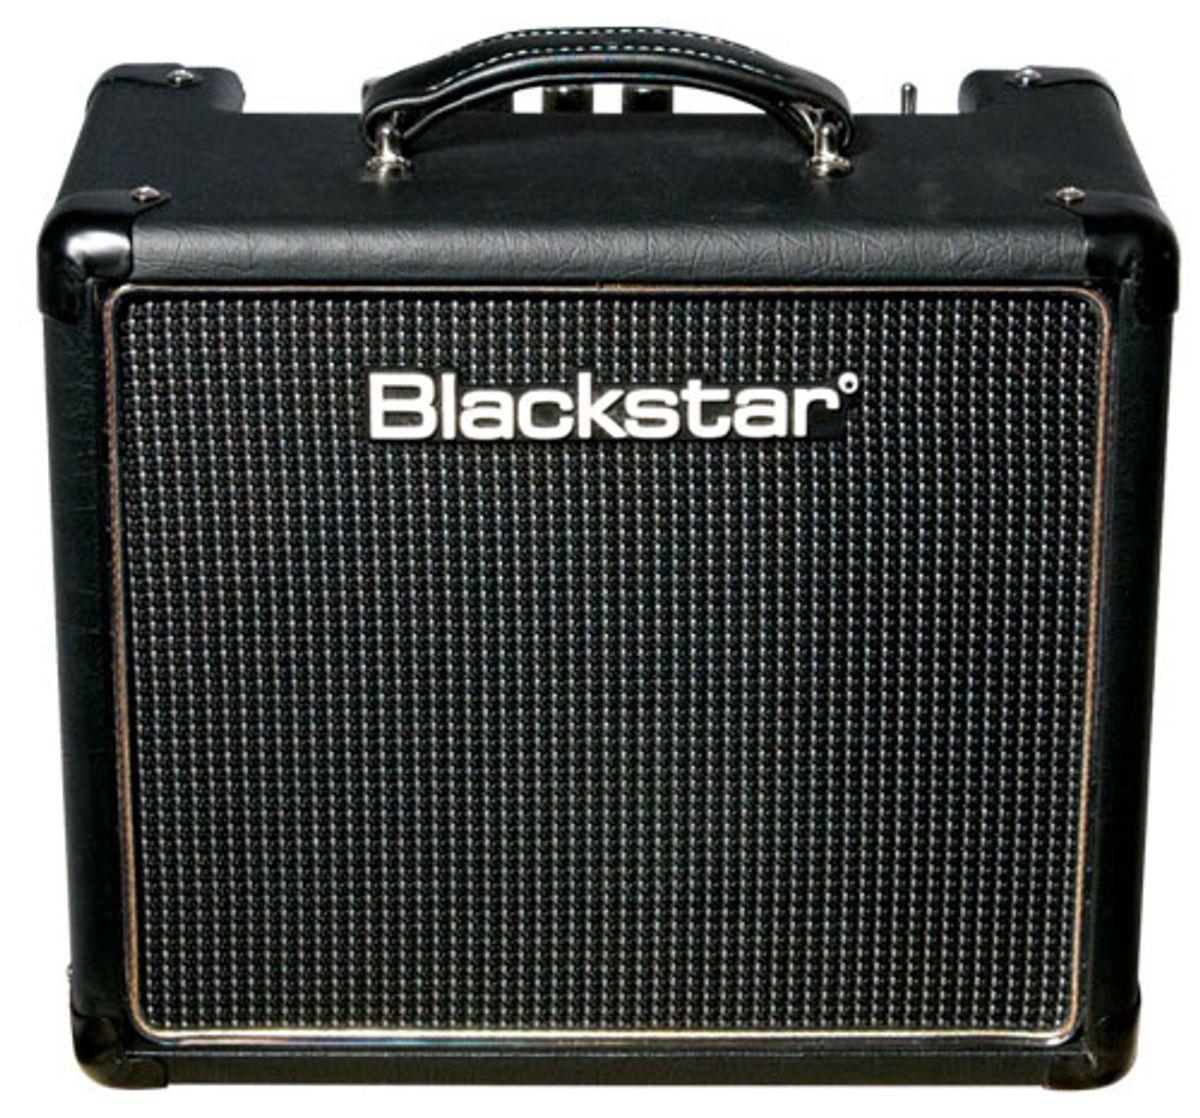 Blackstar HT-1R Amp Review